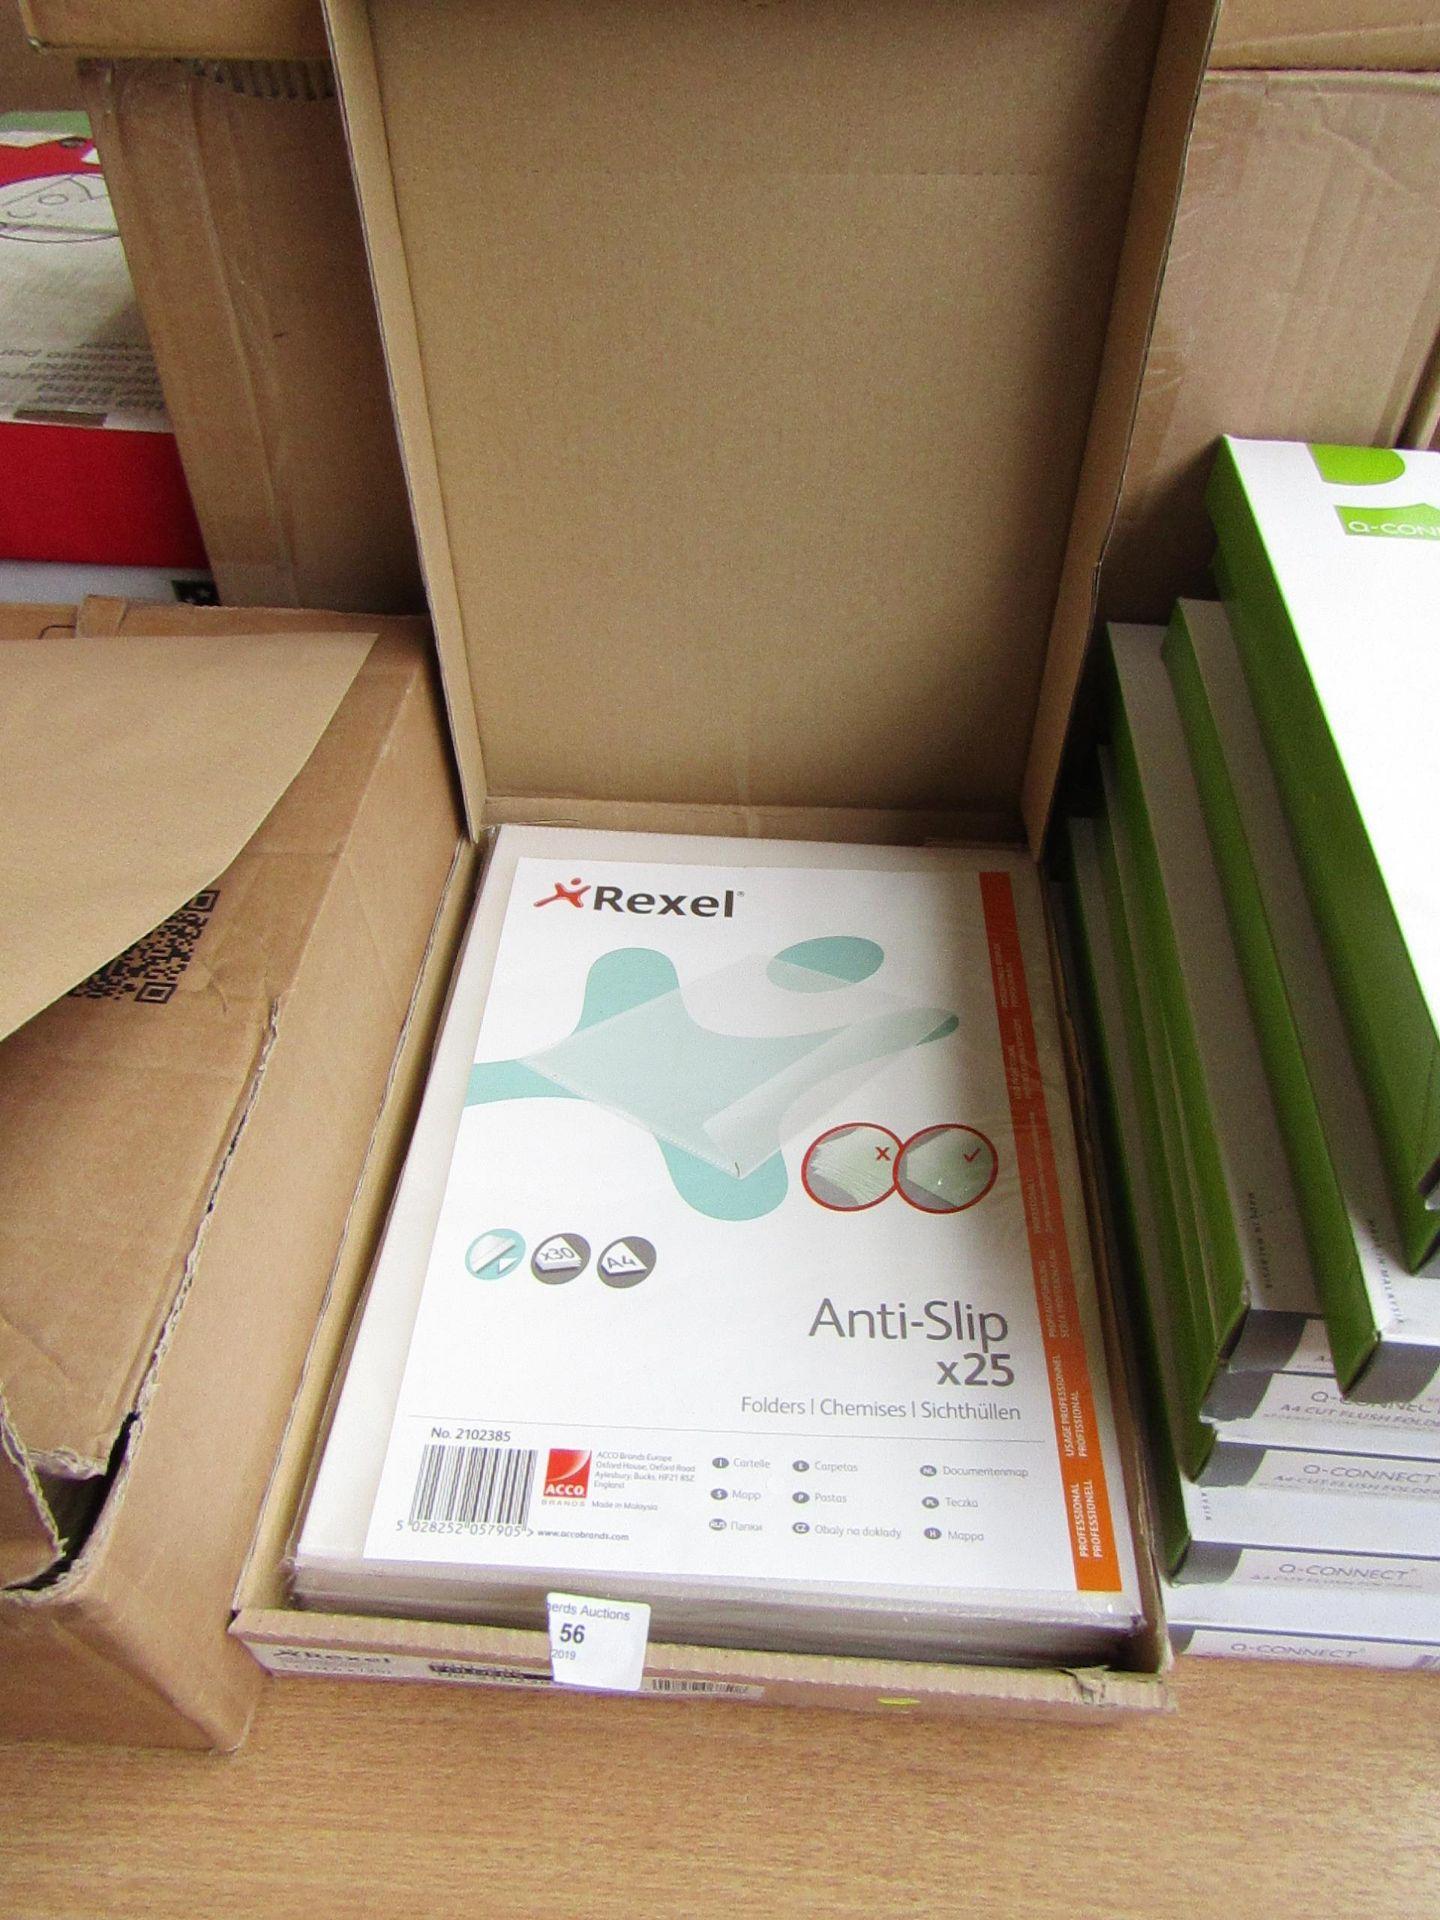 Lot 56 - Box of approx 25 Rexel Non Slip folders, unused